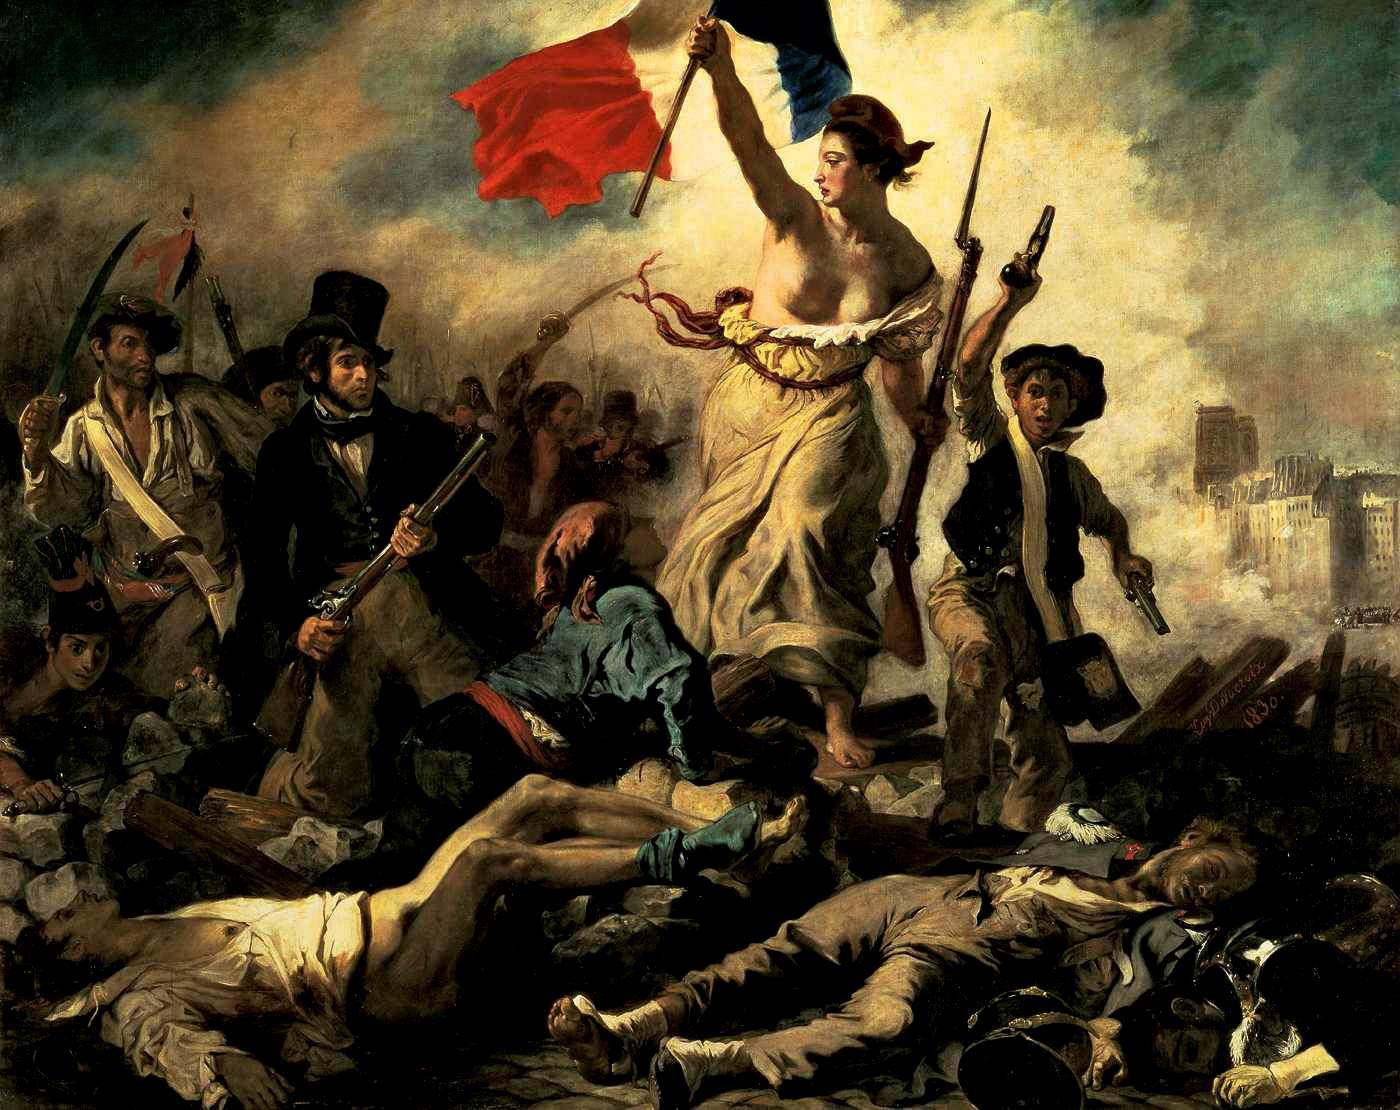 https://commons.wikimedia.org/wiki/File:Eug%C3%A8ne_Delacroix,_La_libert%C3%A9_guidant_le_peuple.jpg